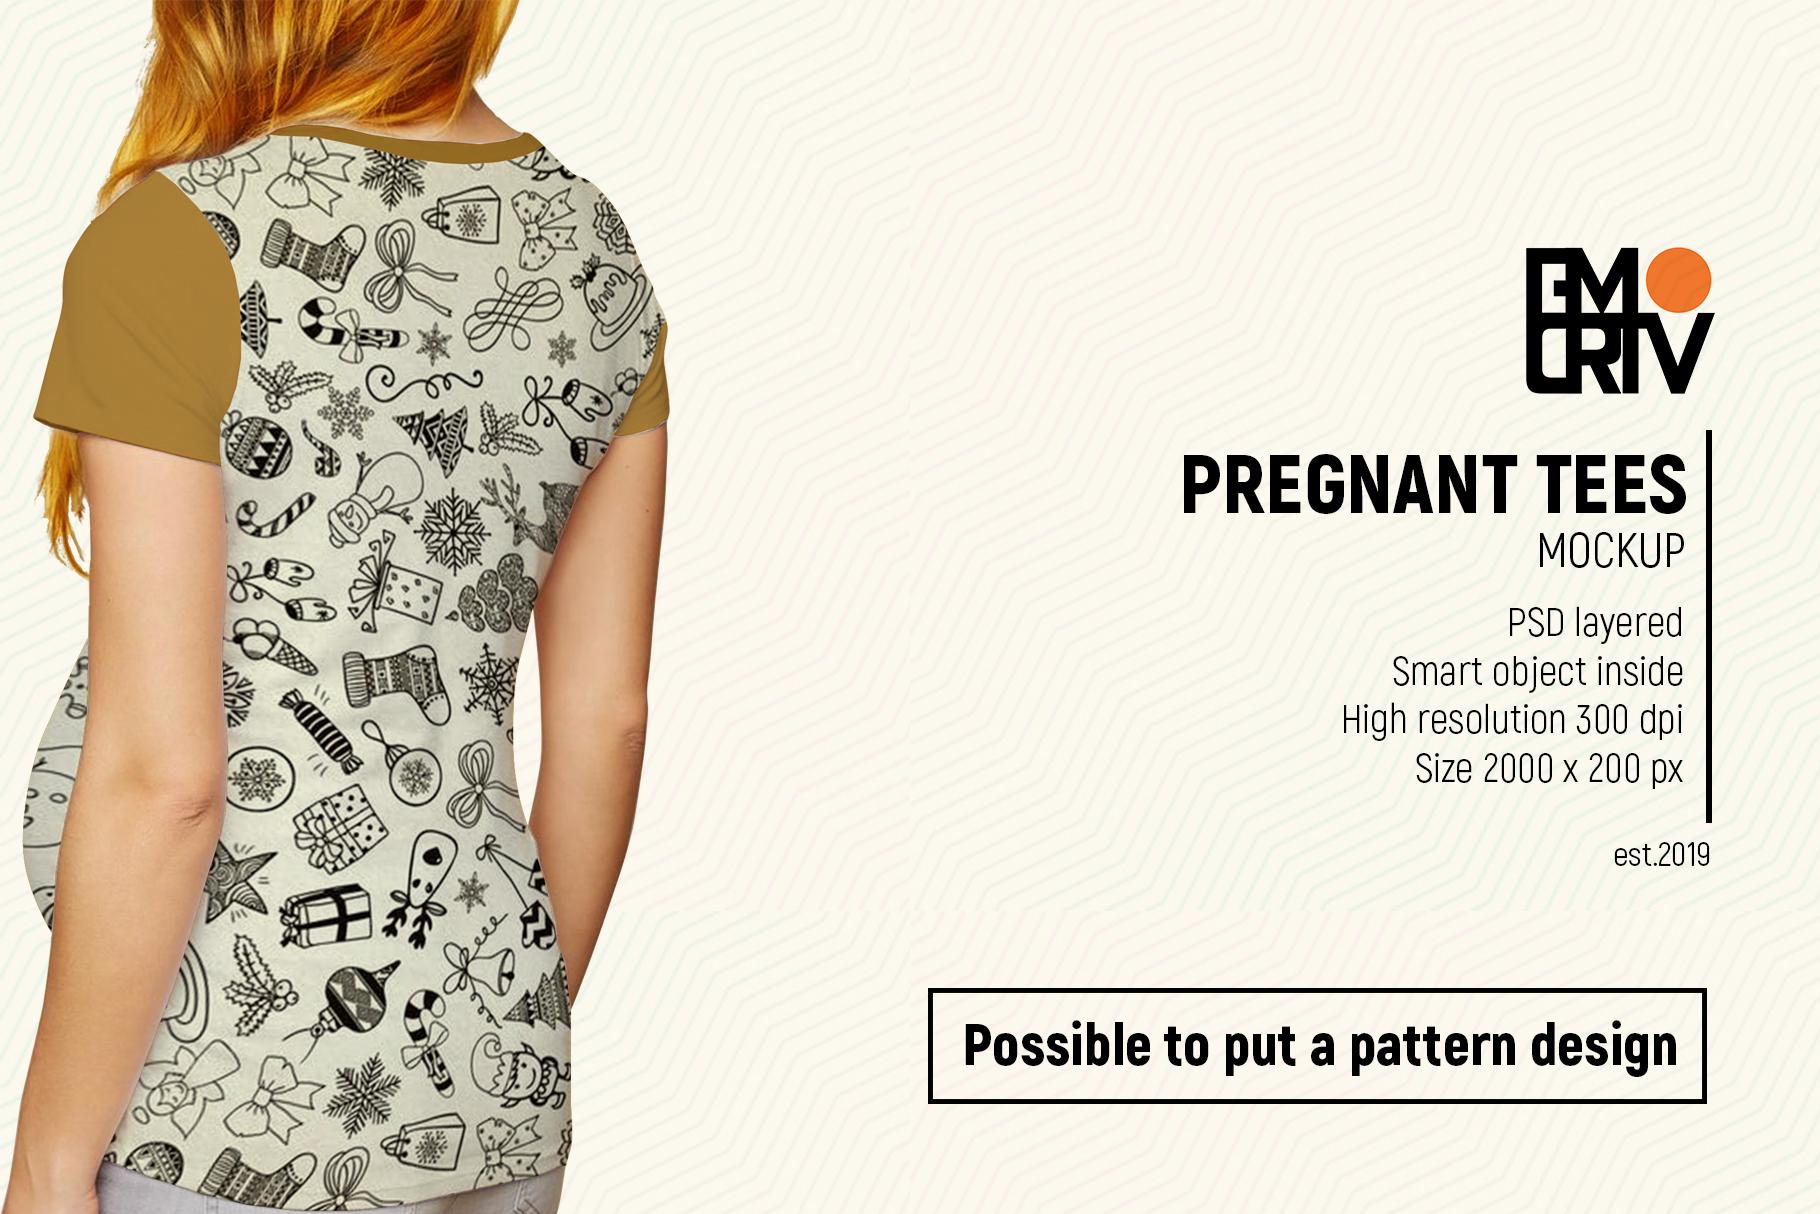 Pregnant Tees Mockup example image 7